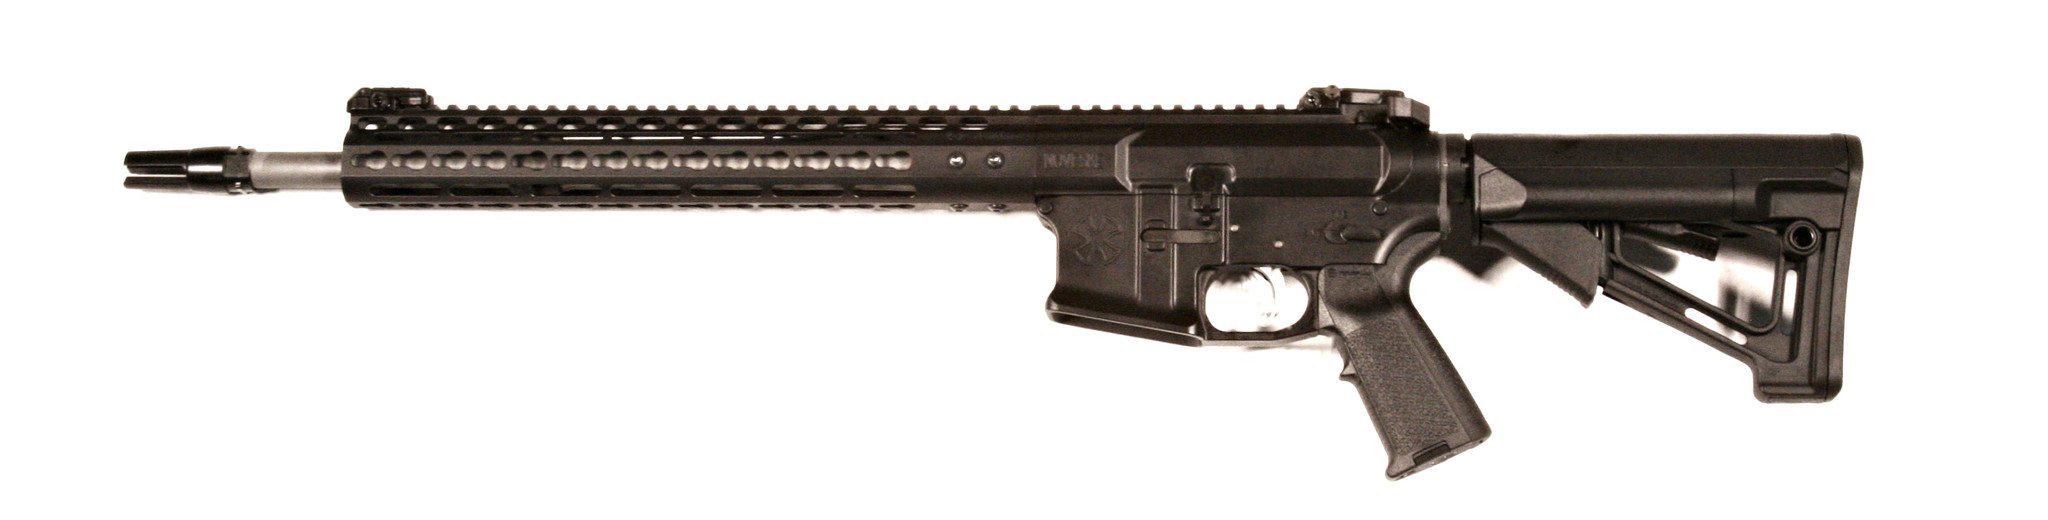 Noveske Rifleworks Gen III Recon